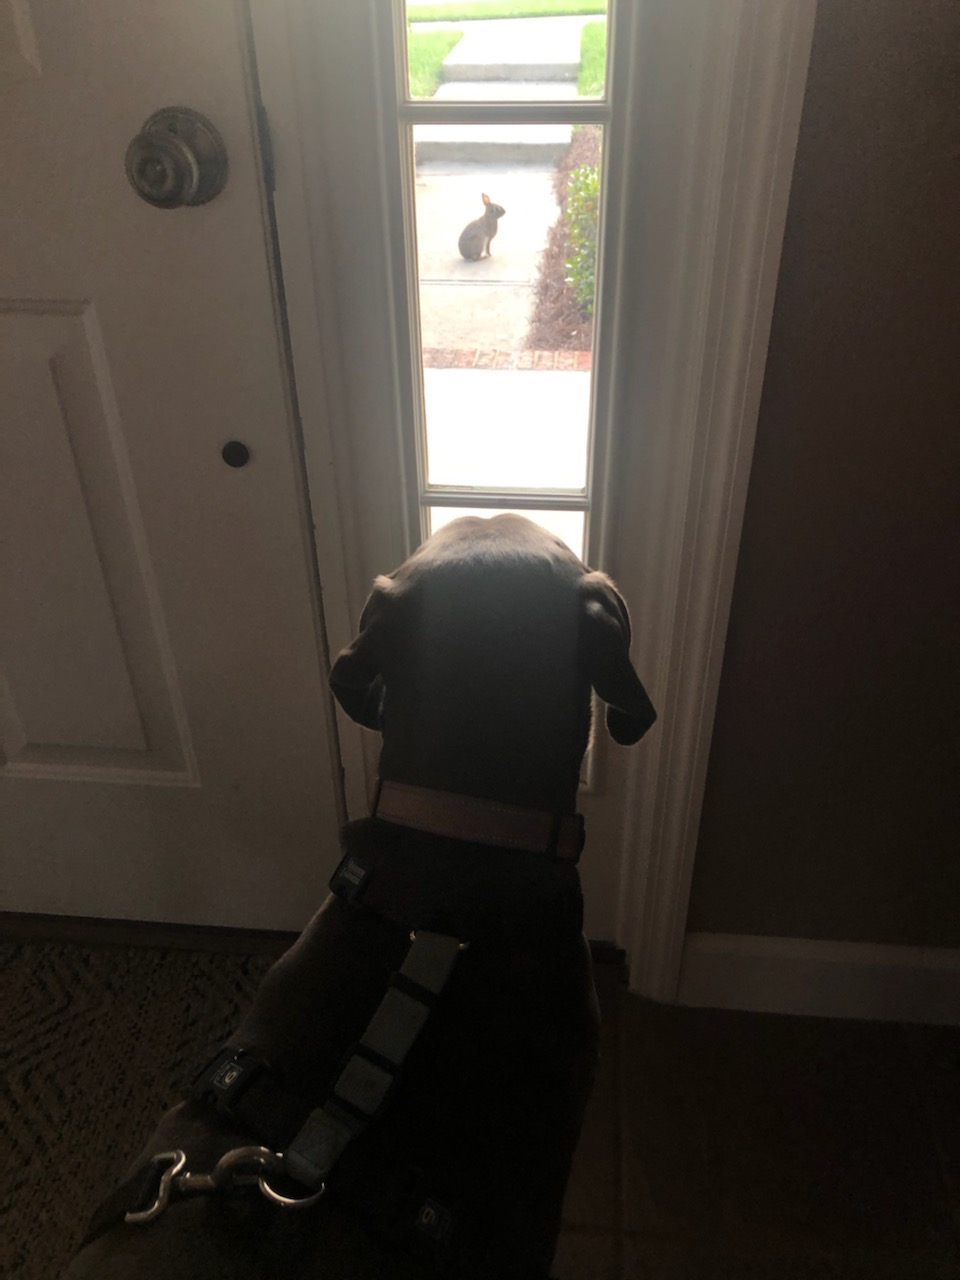 Dog seeing bunny through window